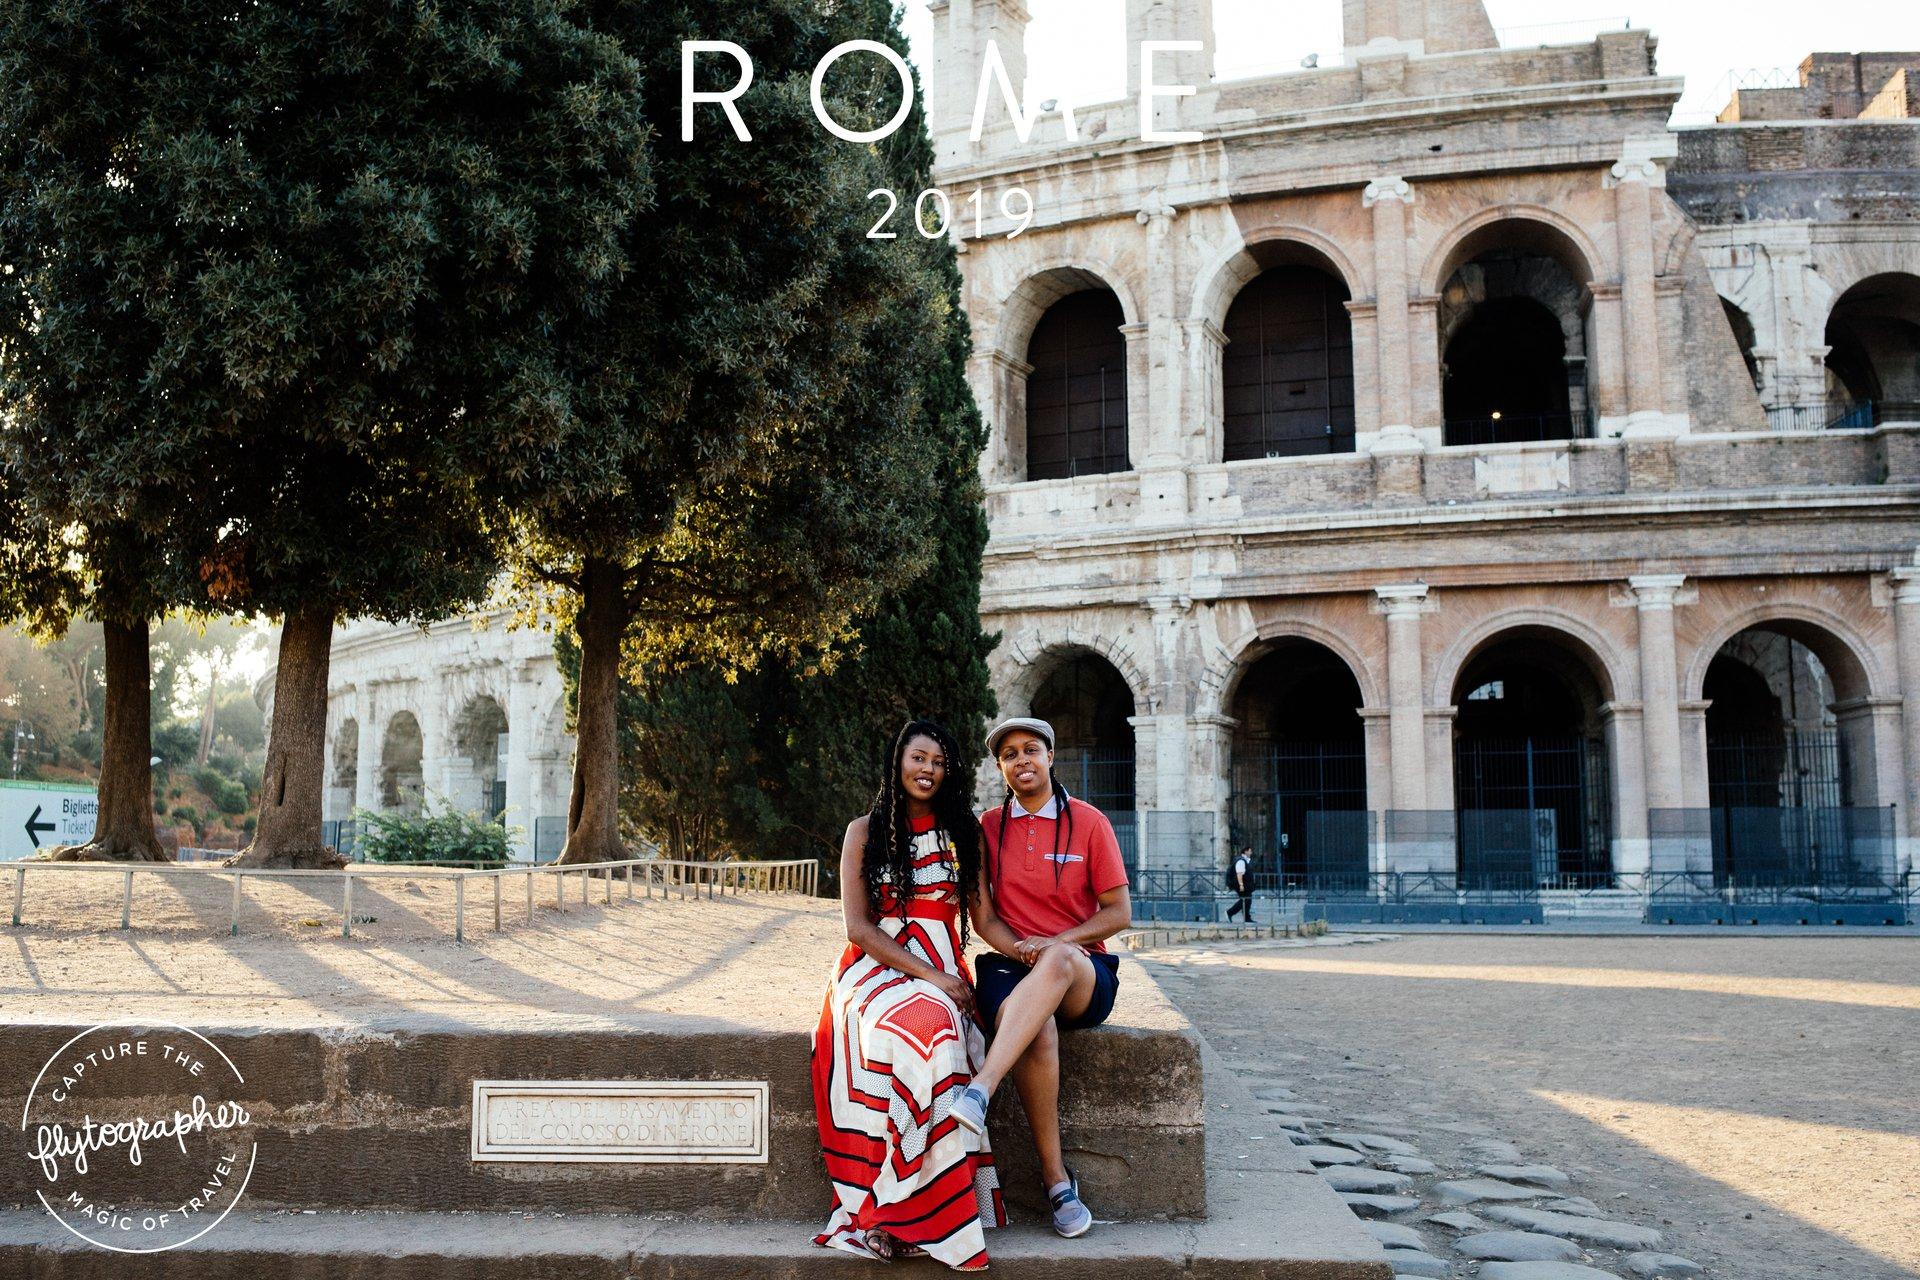 Rome-Italy-travel-story-Flytographer-66